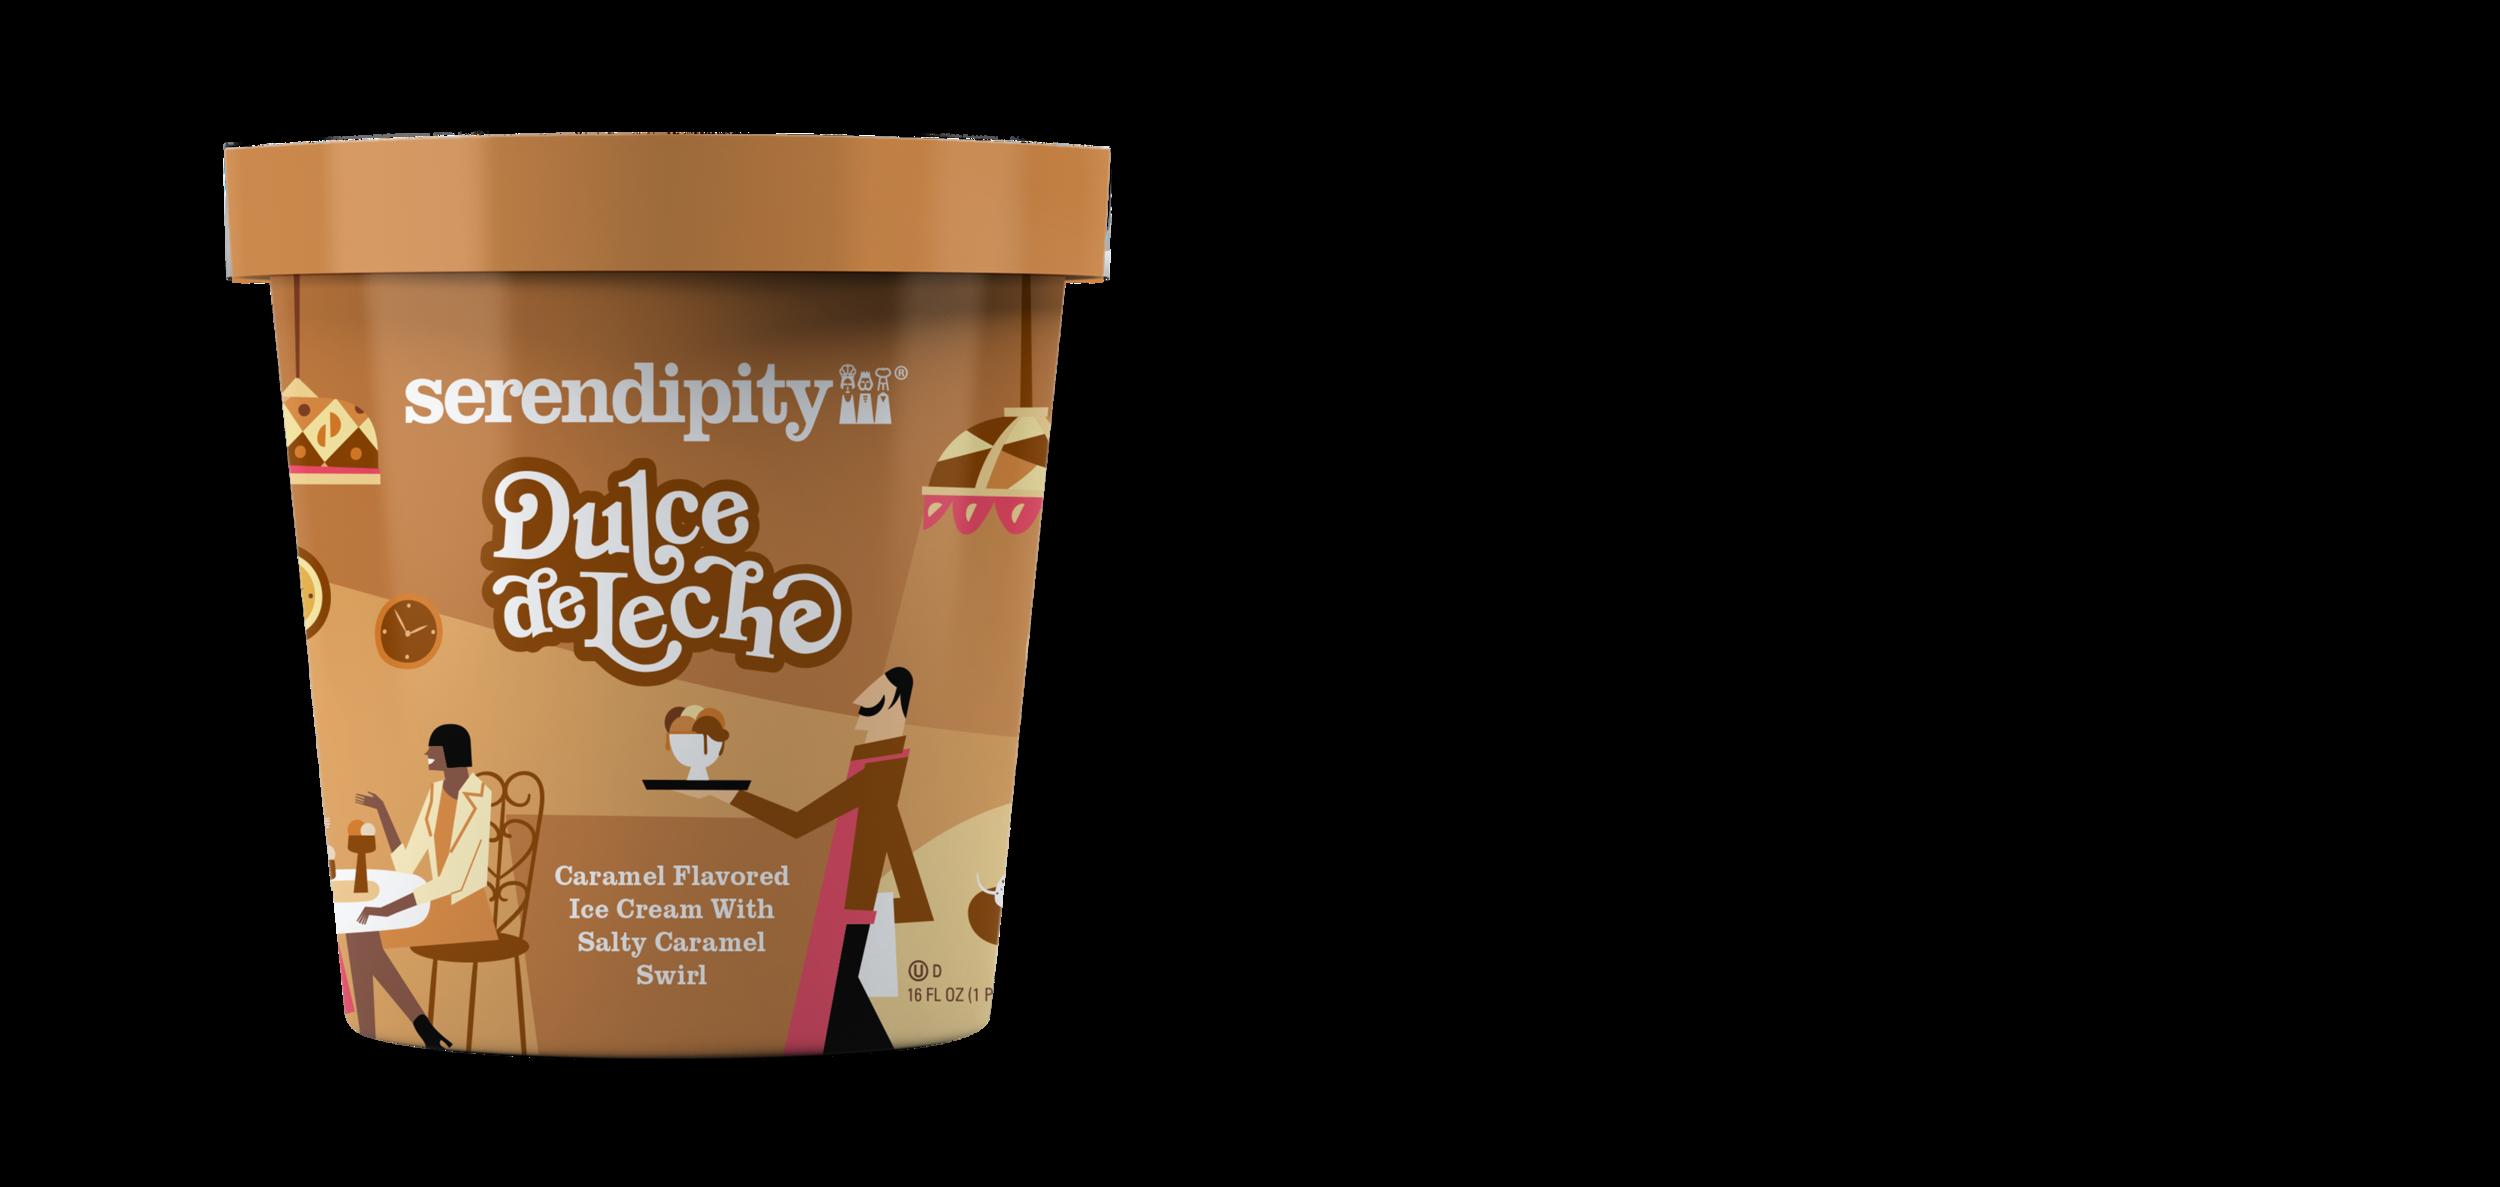 Dulce de Leche - Caramel Flavored Ice Cream with Salty Caramel Swirl